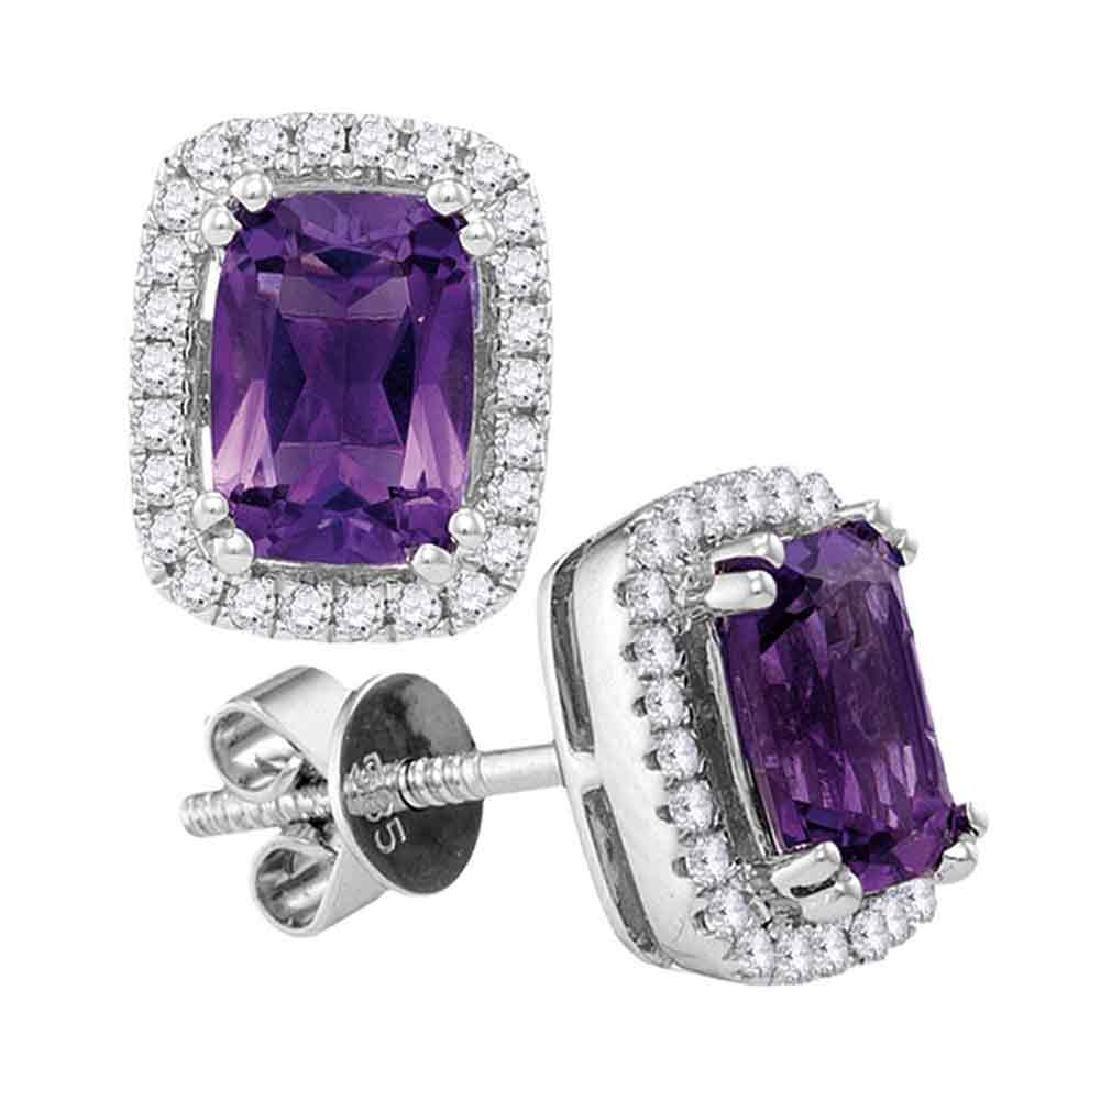 1.87 CTW Oval Natural Amethyst Diamond Stud Earrings